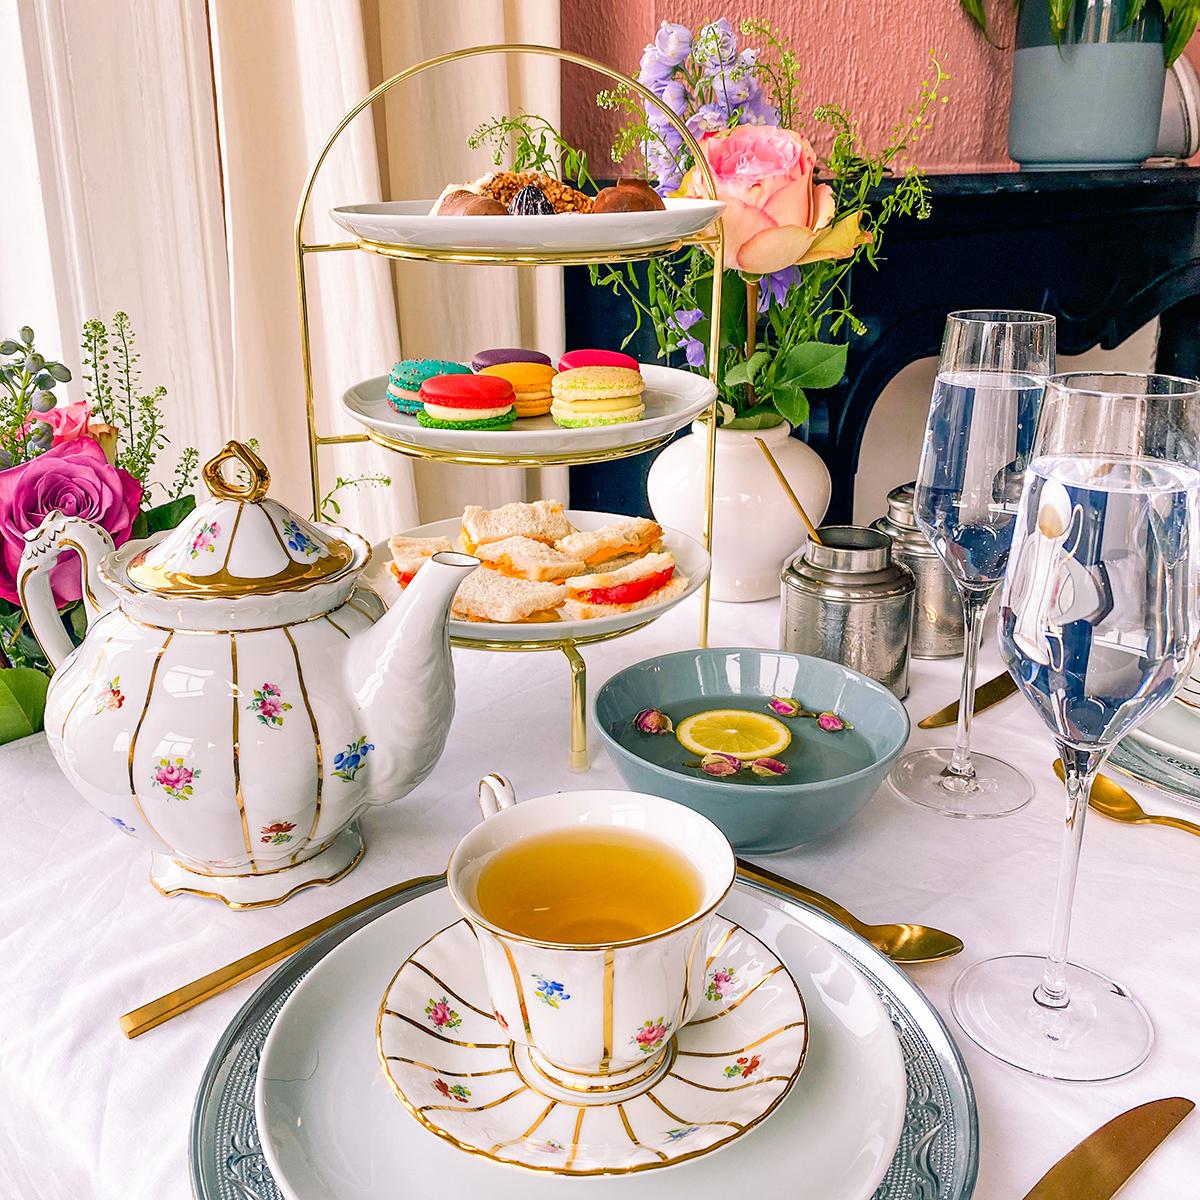 High Tea Of Afternoon Tea?